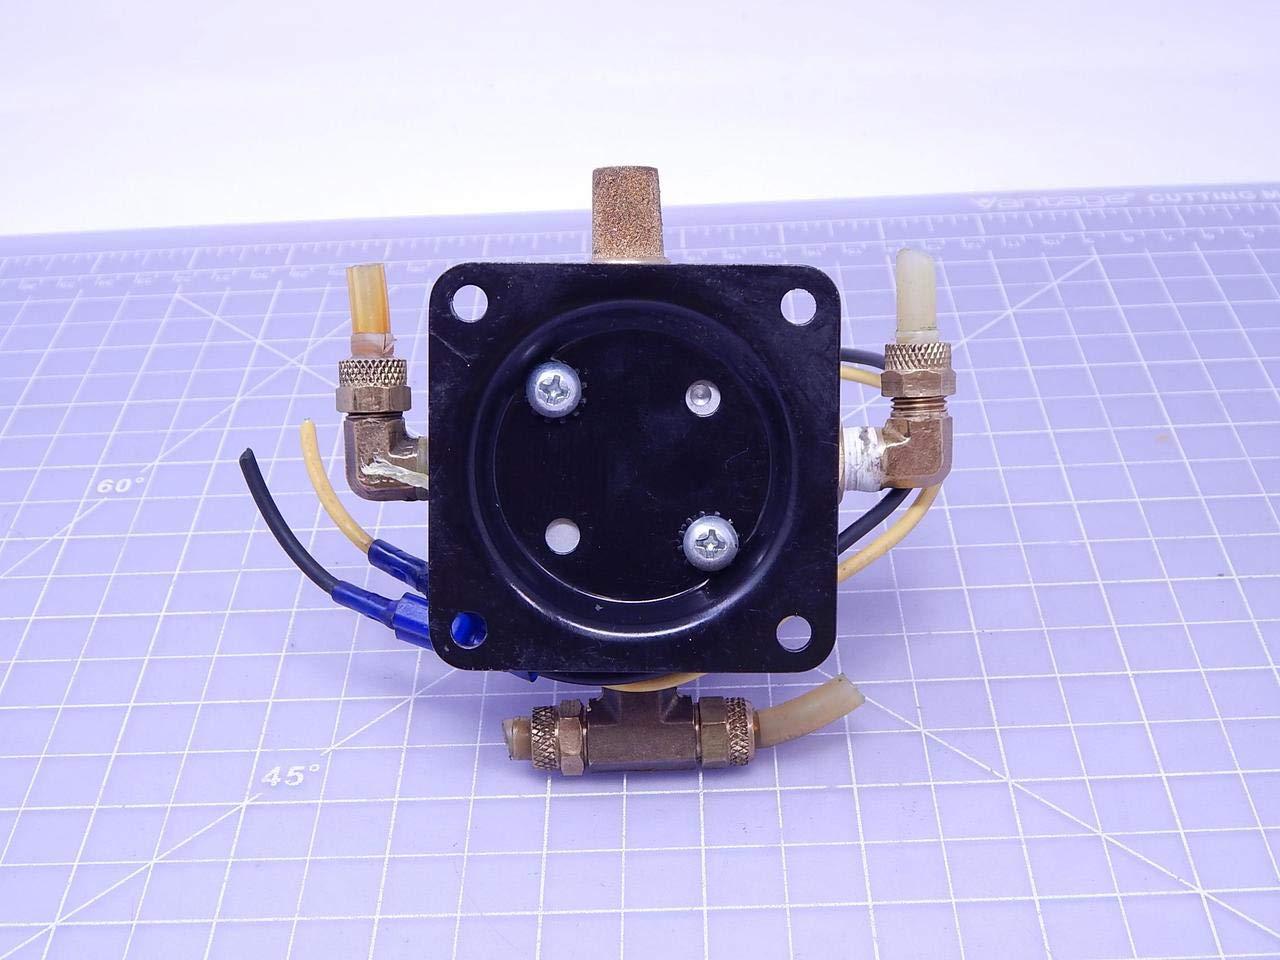 0.25 x 1.75 Copper Rectangle Bar 110-H02 144.0